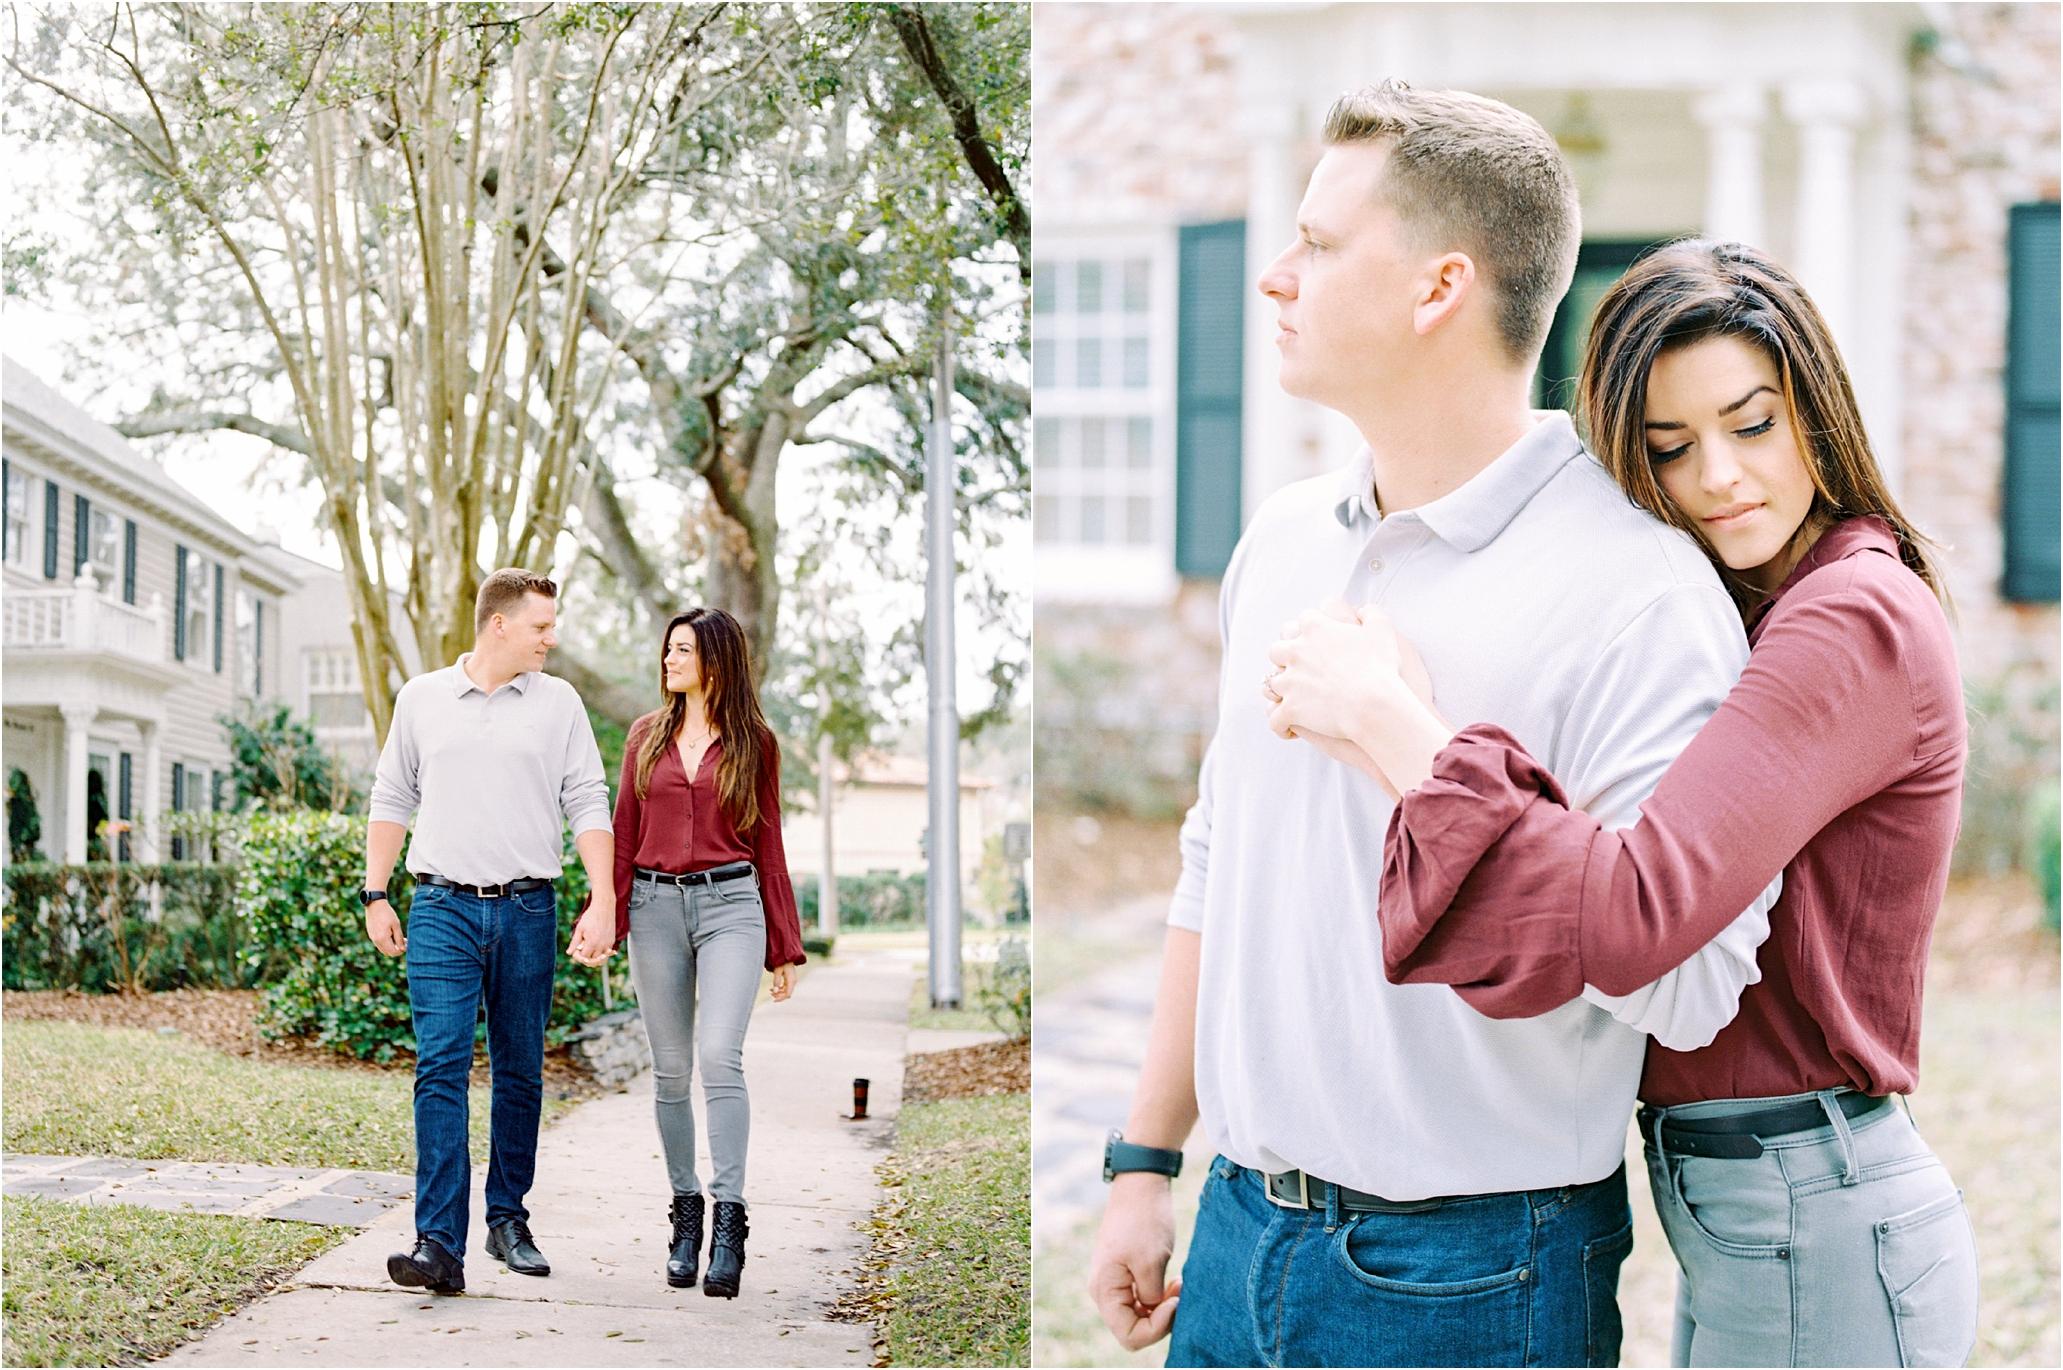 Lisa Silva Photography- Ponte Vedra Beach and Jacksonville, Florida Fine Art Film Wedding Photography- San Marco Jacksonville florida Engagement Session_0010.jpg